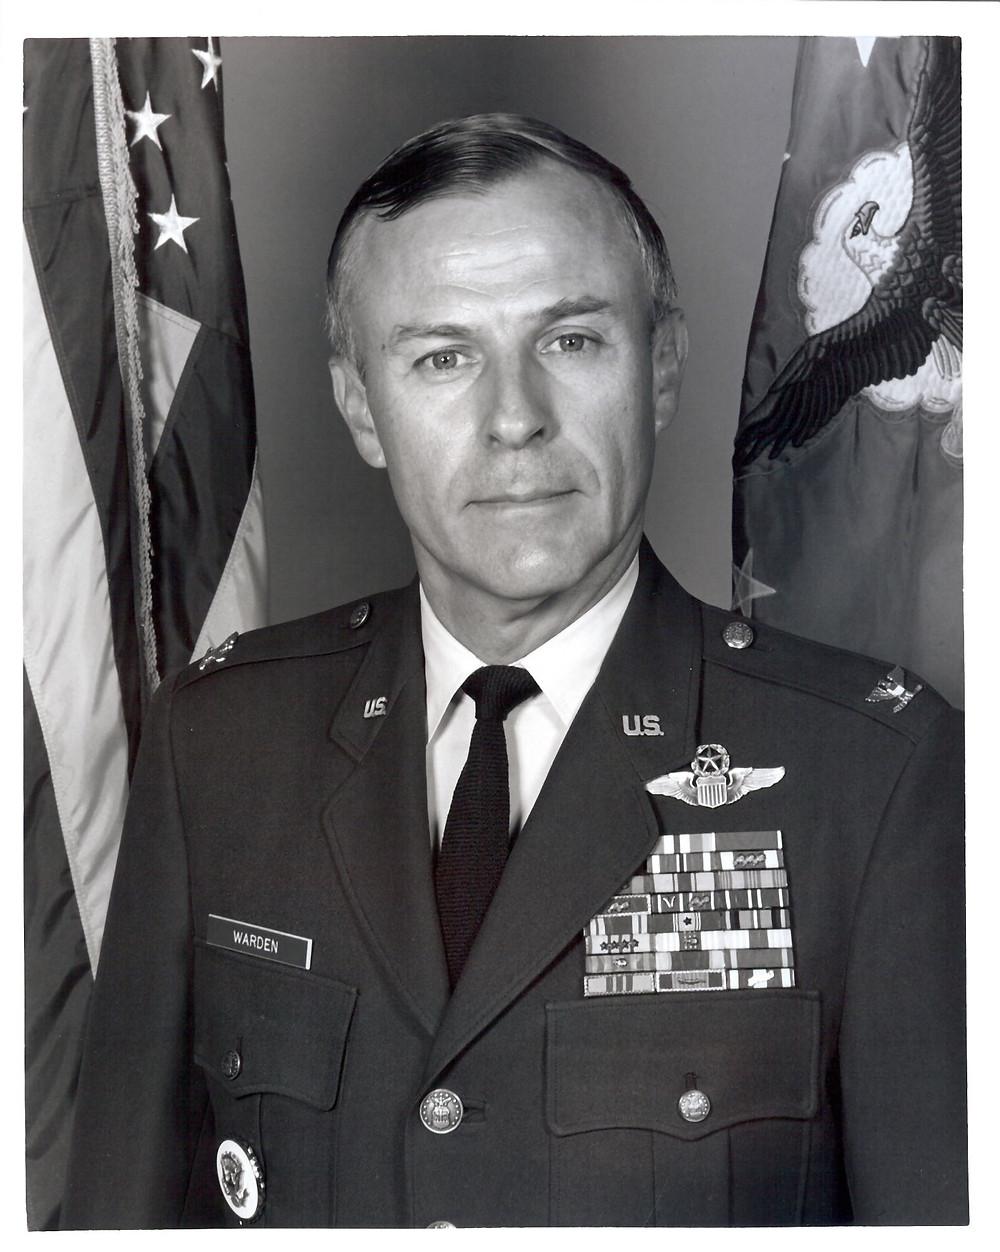 Colonel John A. Warden III, USAF, Ret.